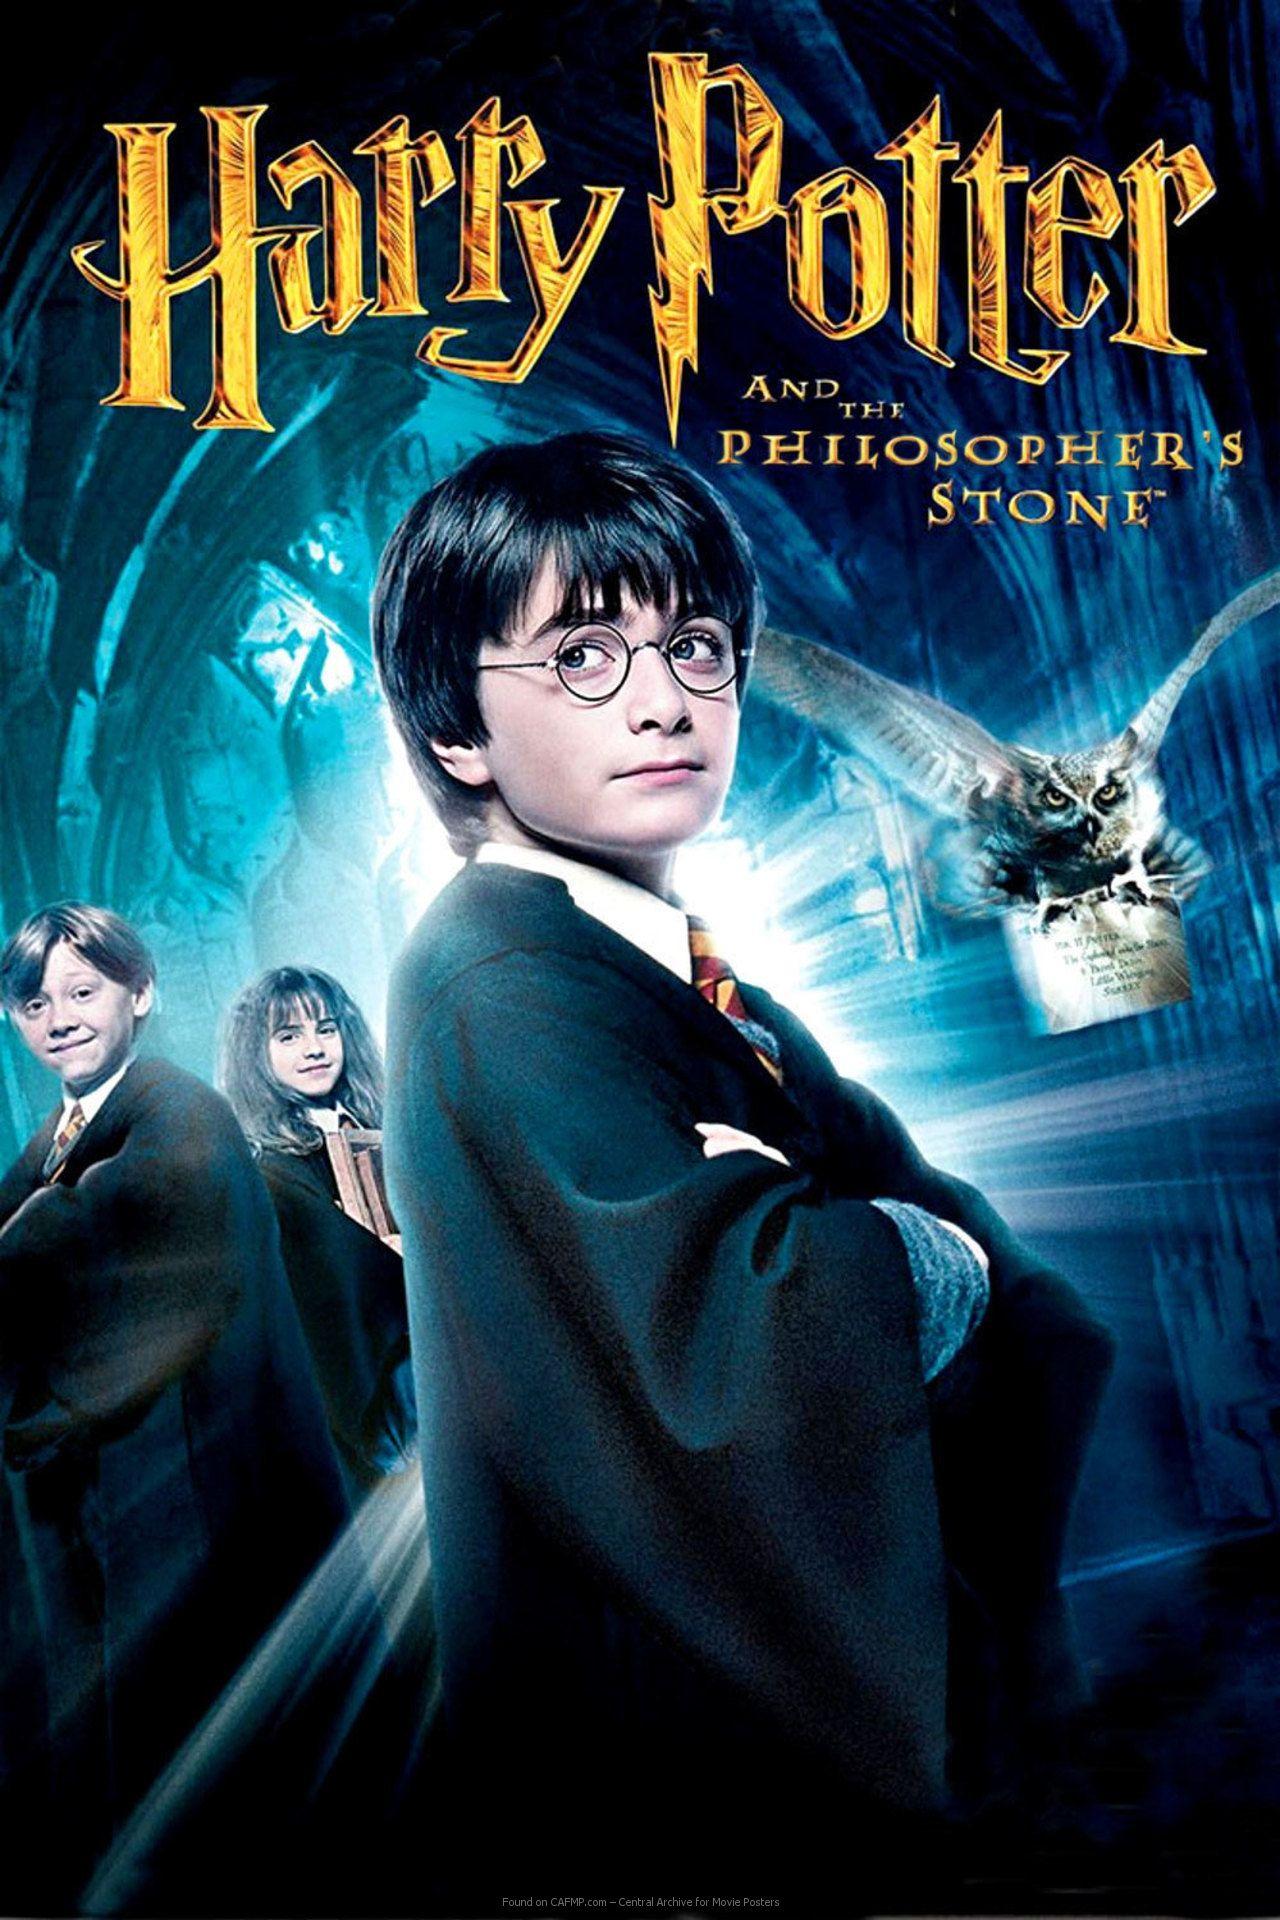 Peliculas Online Gratis Ver Peliculas Online Peliculas De Harry Potter